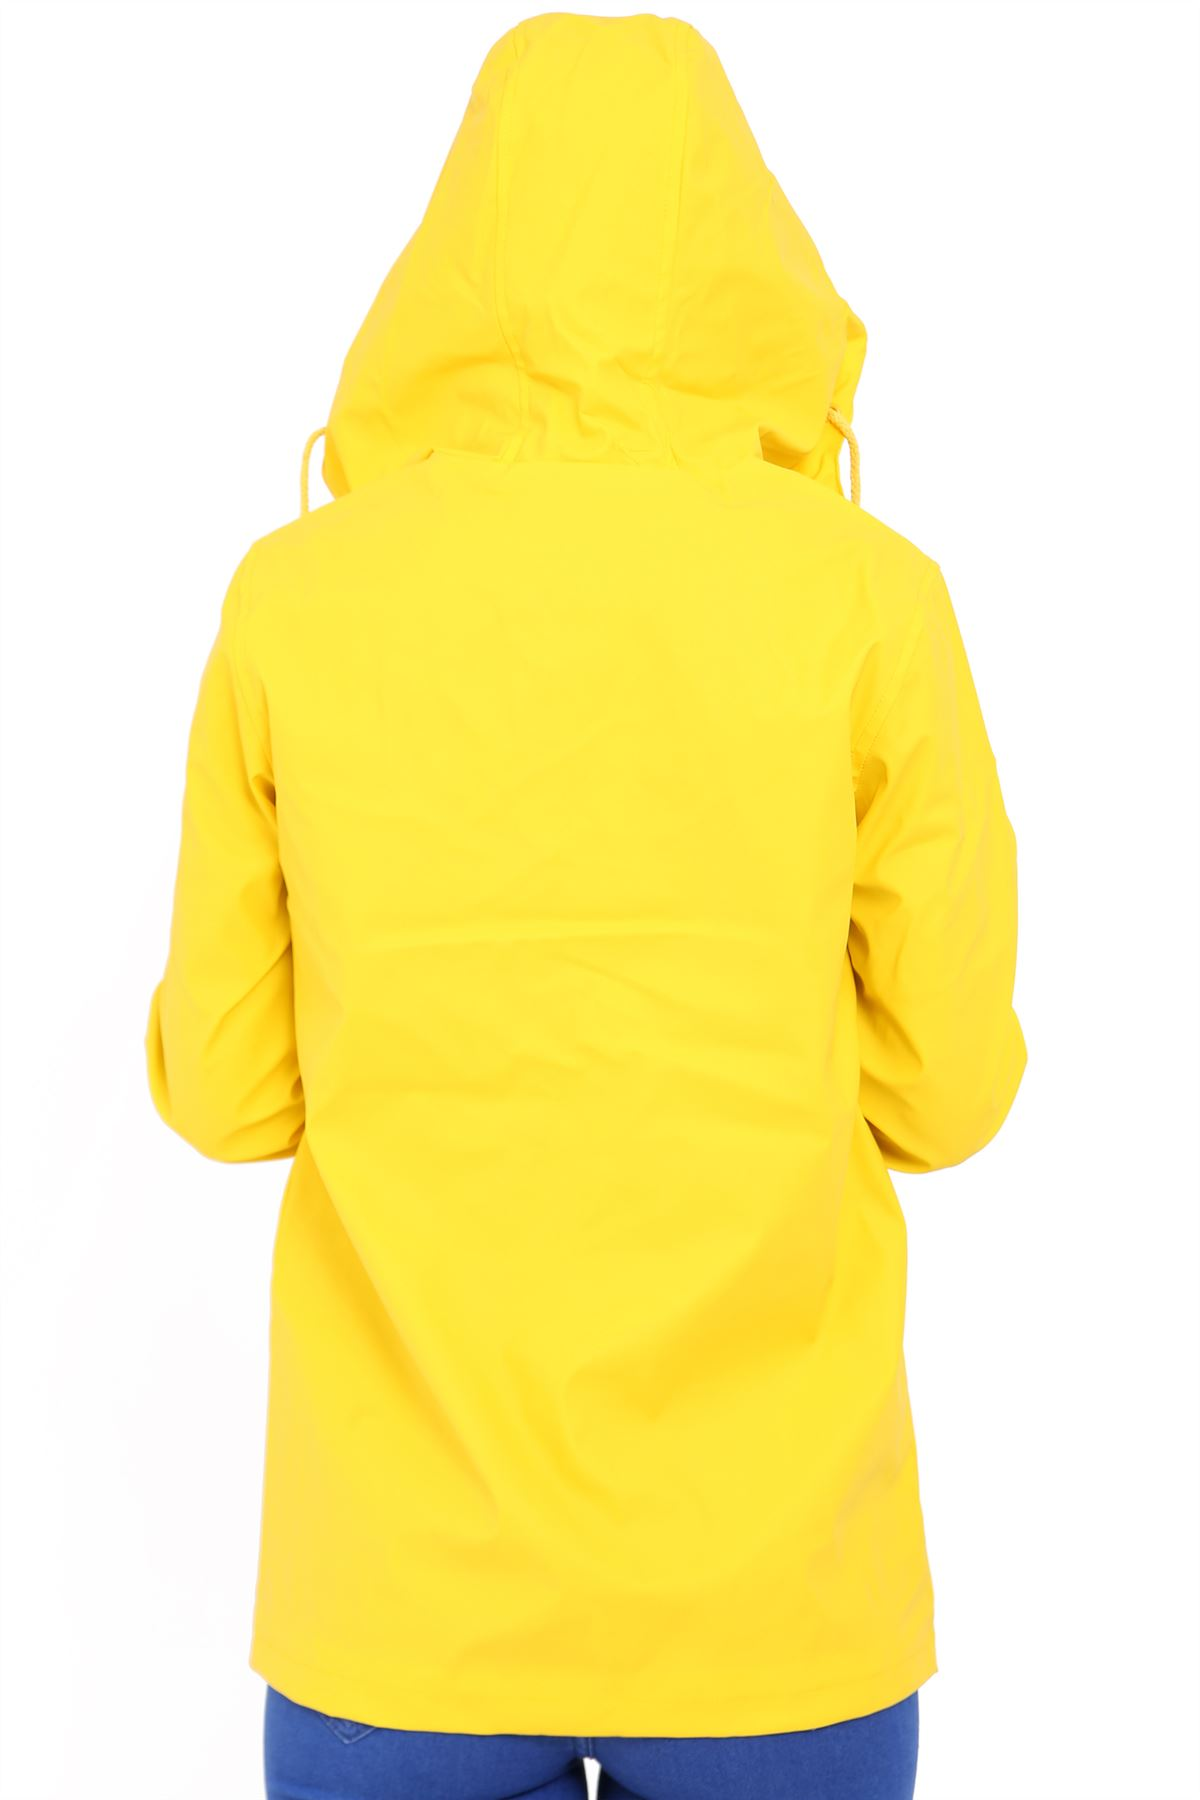 New-Womens-Lightweight-Rain-Trench-Coat-Jacket-Parka-Daily-Rain-Mac thumbnail 7